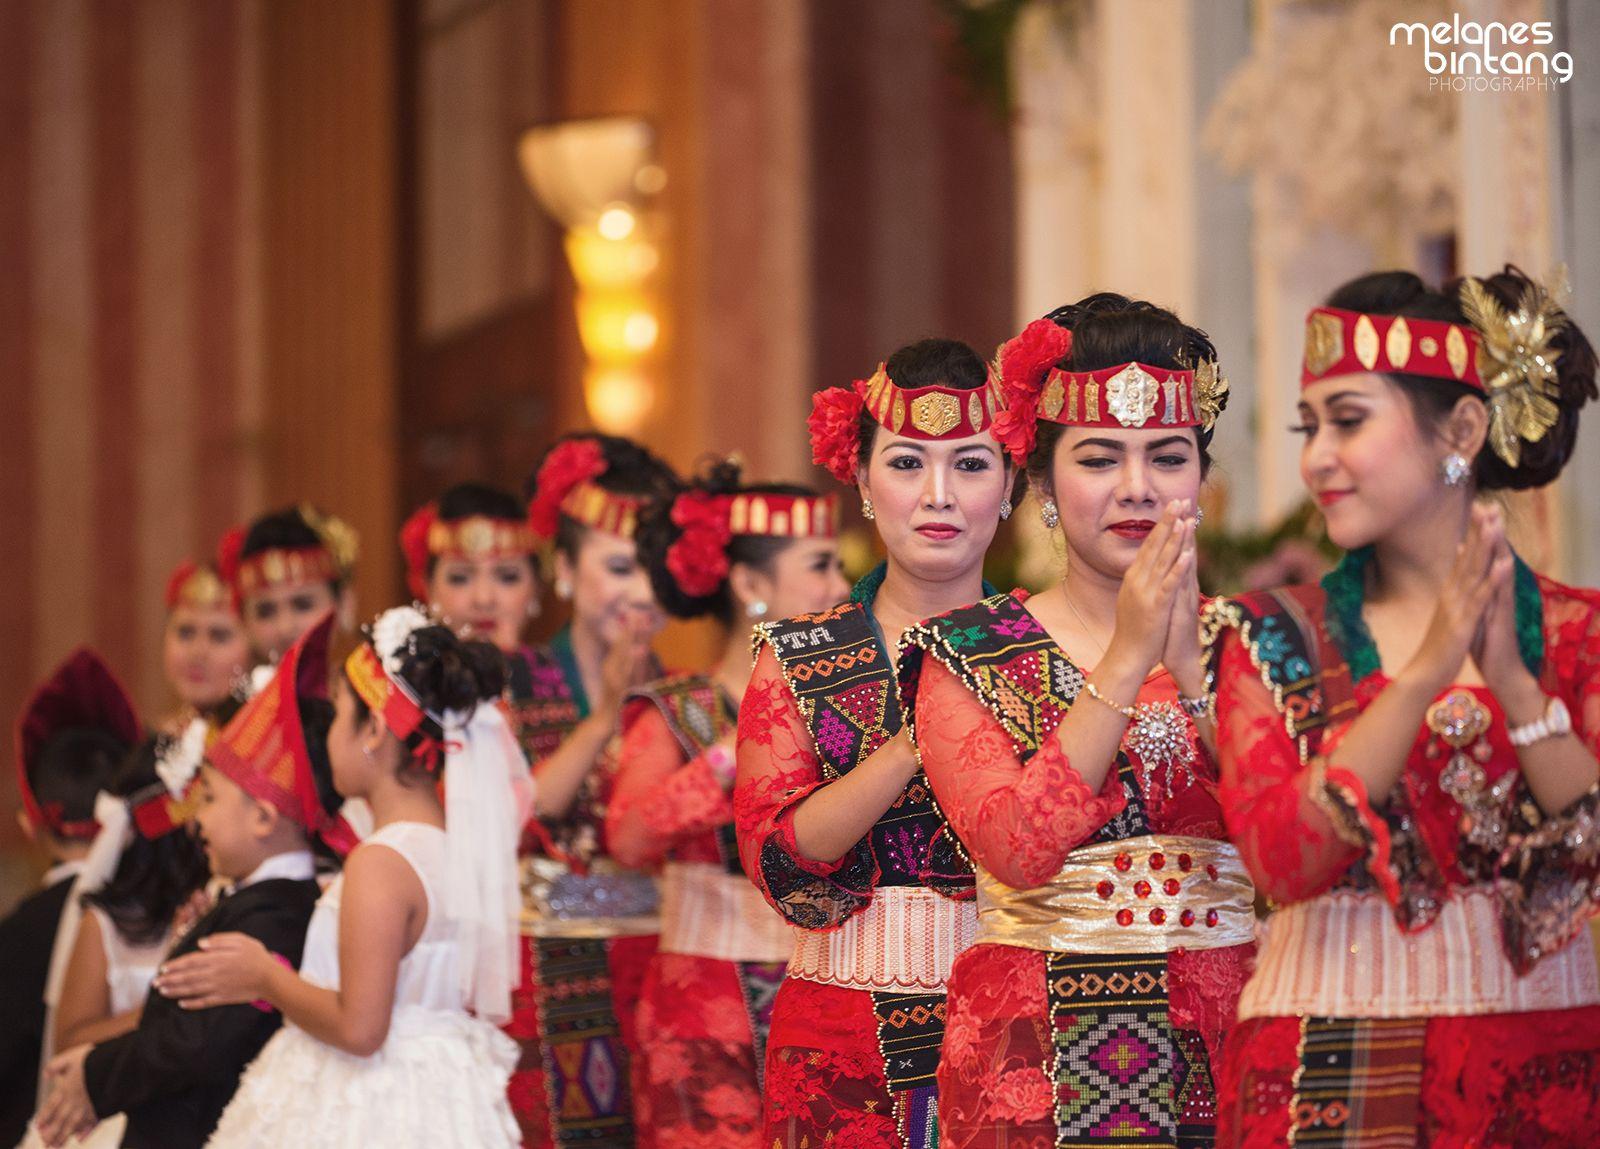 The Traditional Bataknese Wedding Ceremony Http Www Bridestory Com Blog A Beautiful Modern Day Batak Wedding Pengantin Gaya Busana Gambar